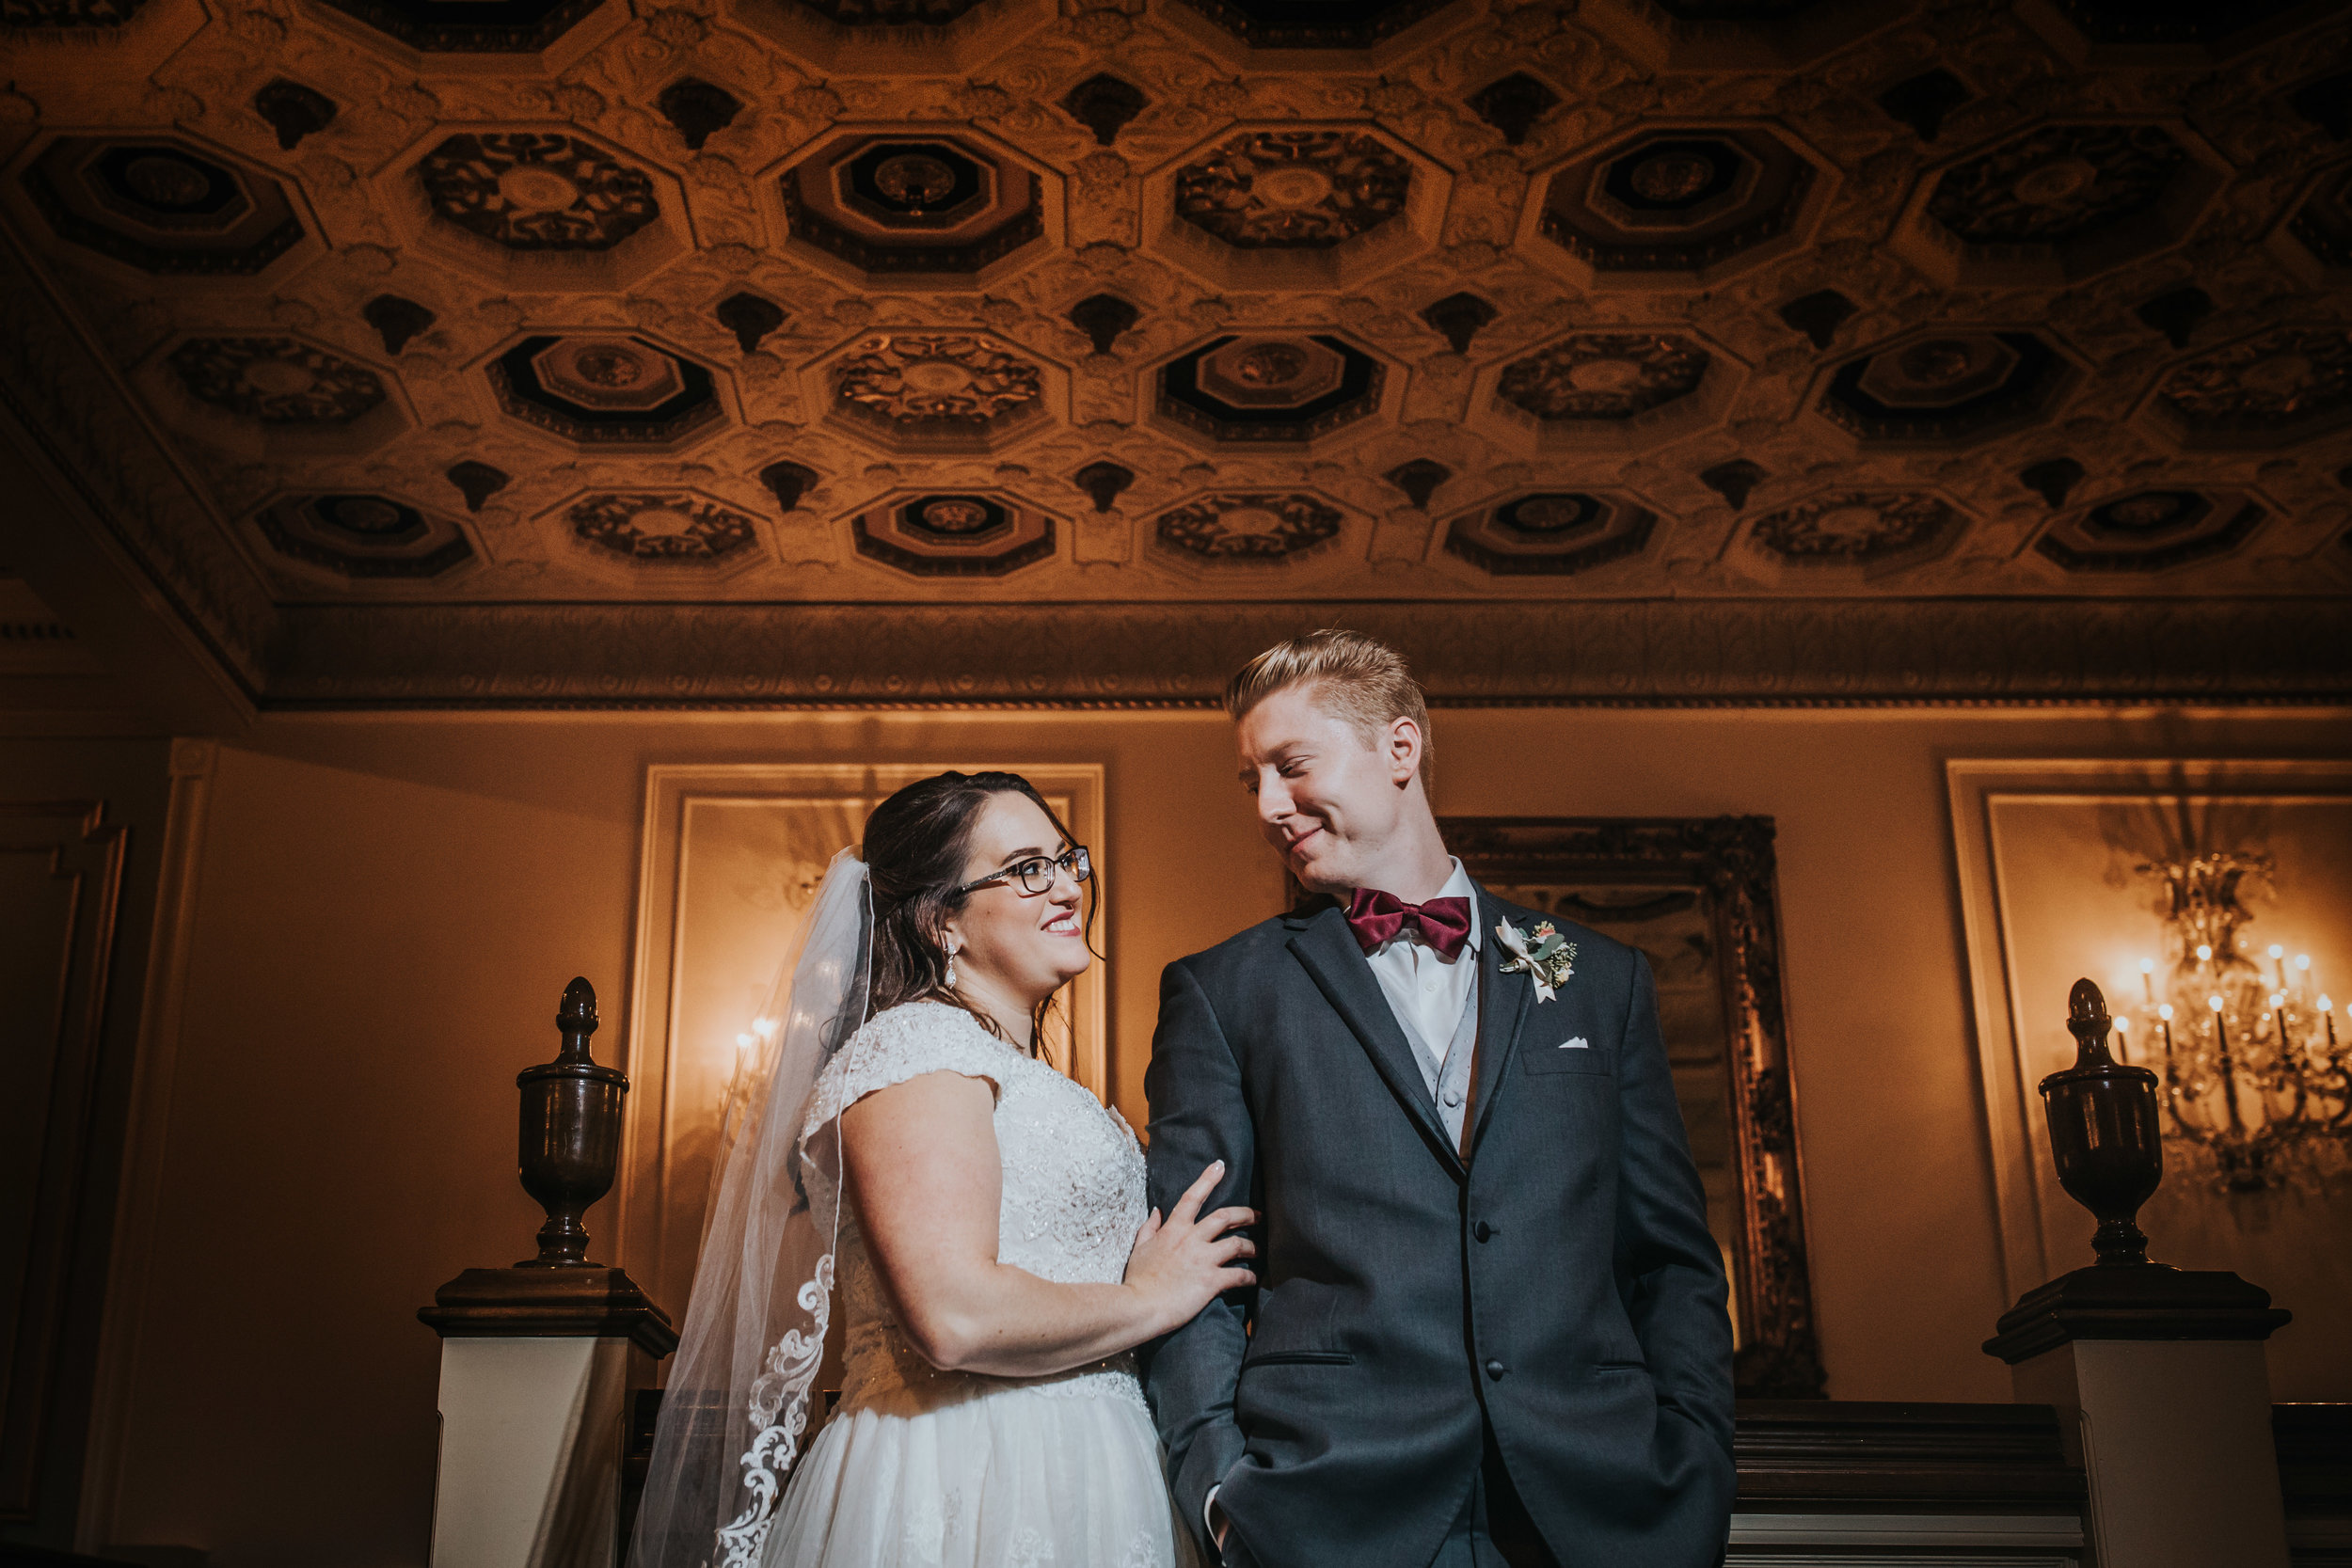 New-Jersey-Wedding-Photography-Fishers-Tudor-House-JennaLynnPhotography-Bride&Groom-Kathleen&Eddie-24.jpg